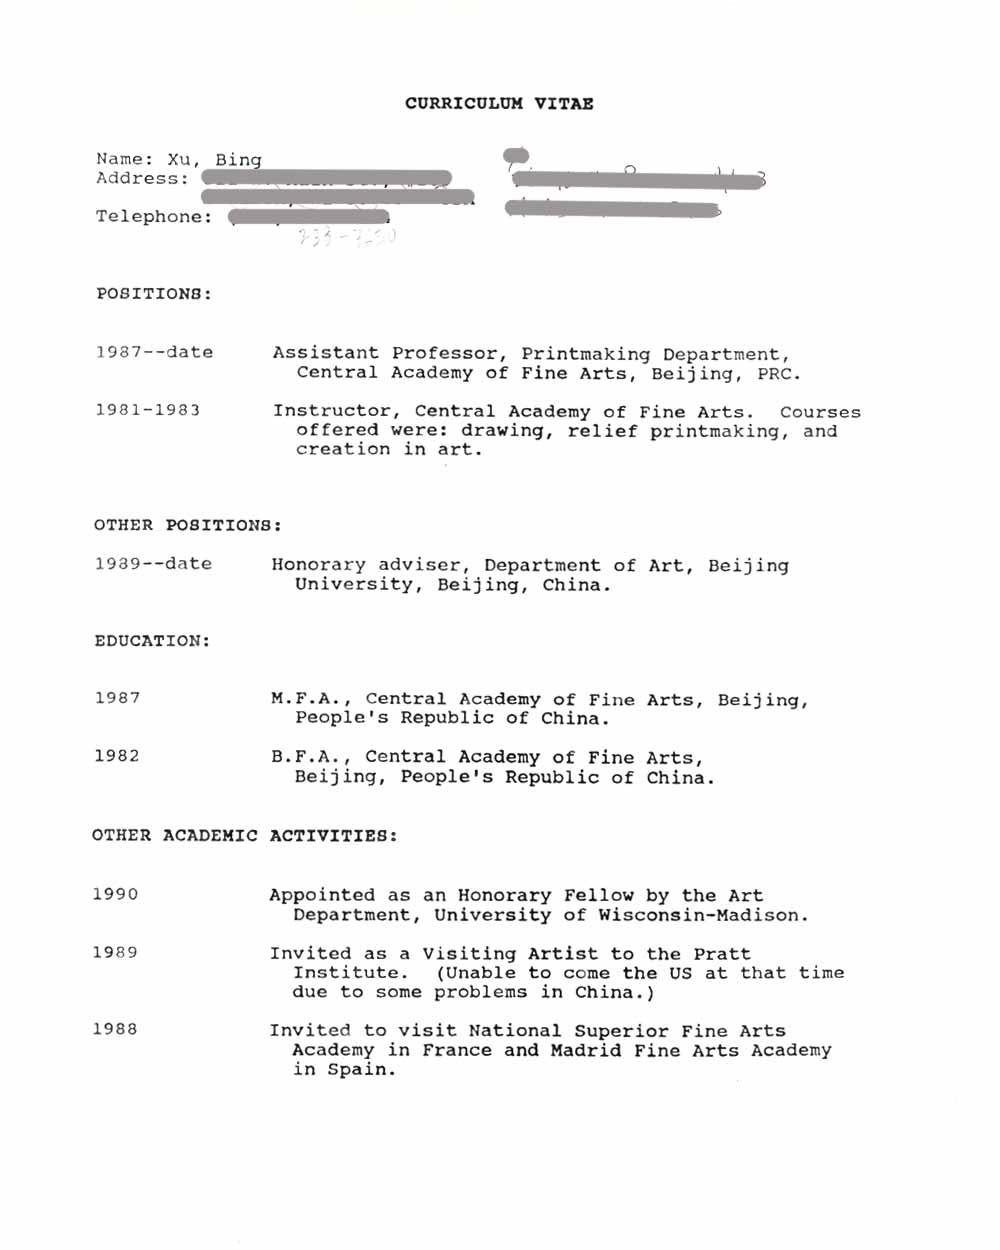 Bing Xu's Resume, pg 1